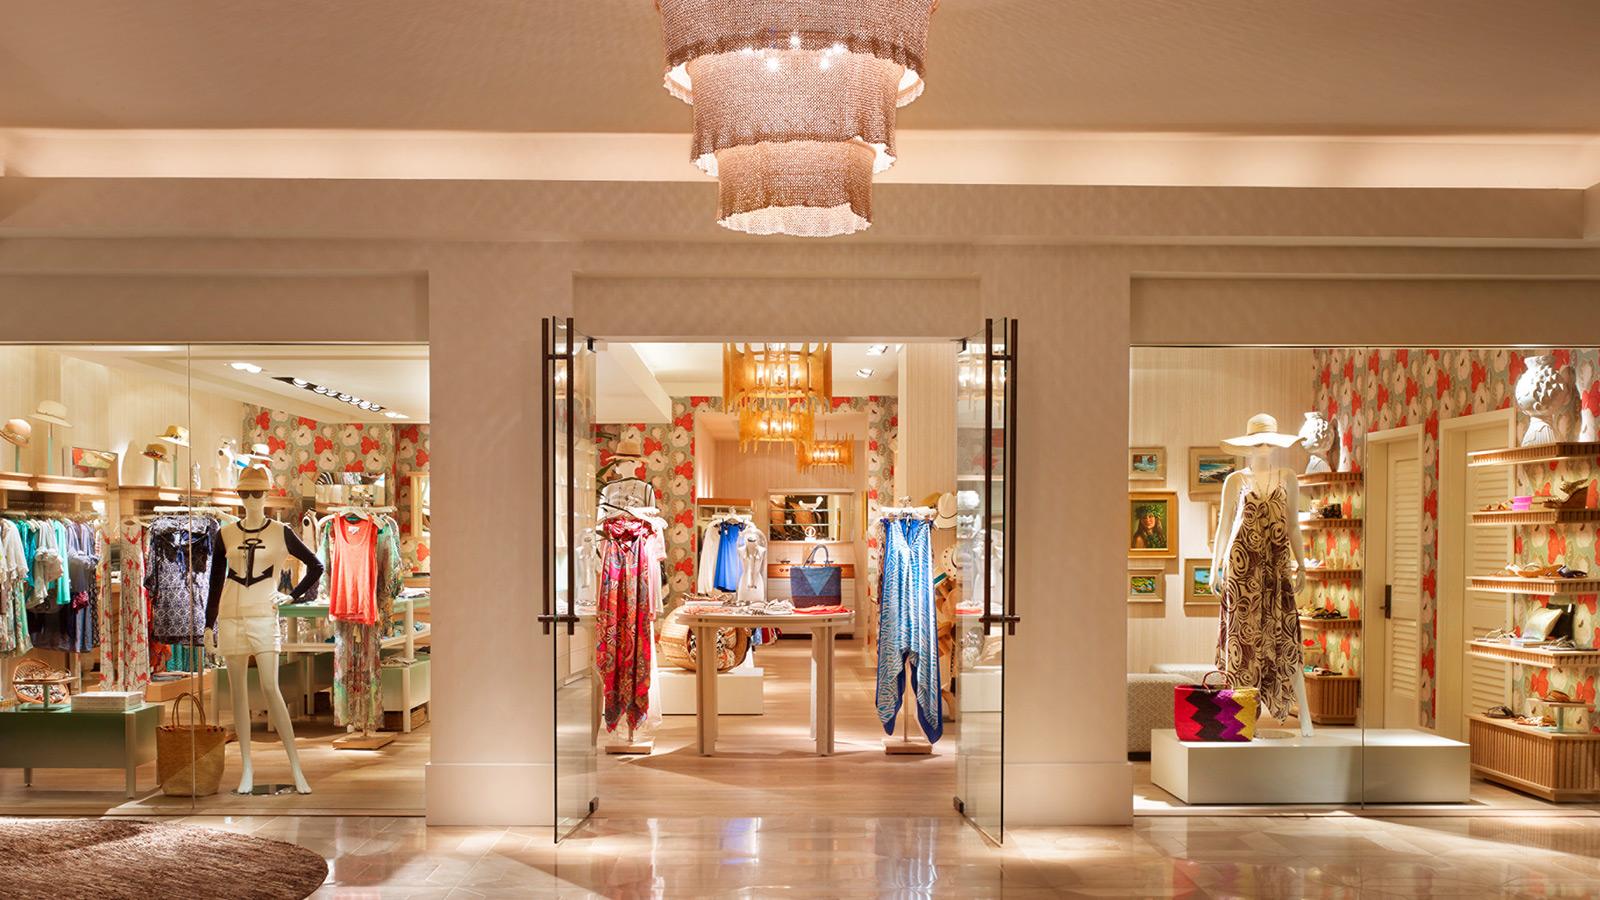 Passive family income passive family income for Luxury boutique